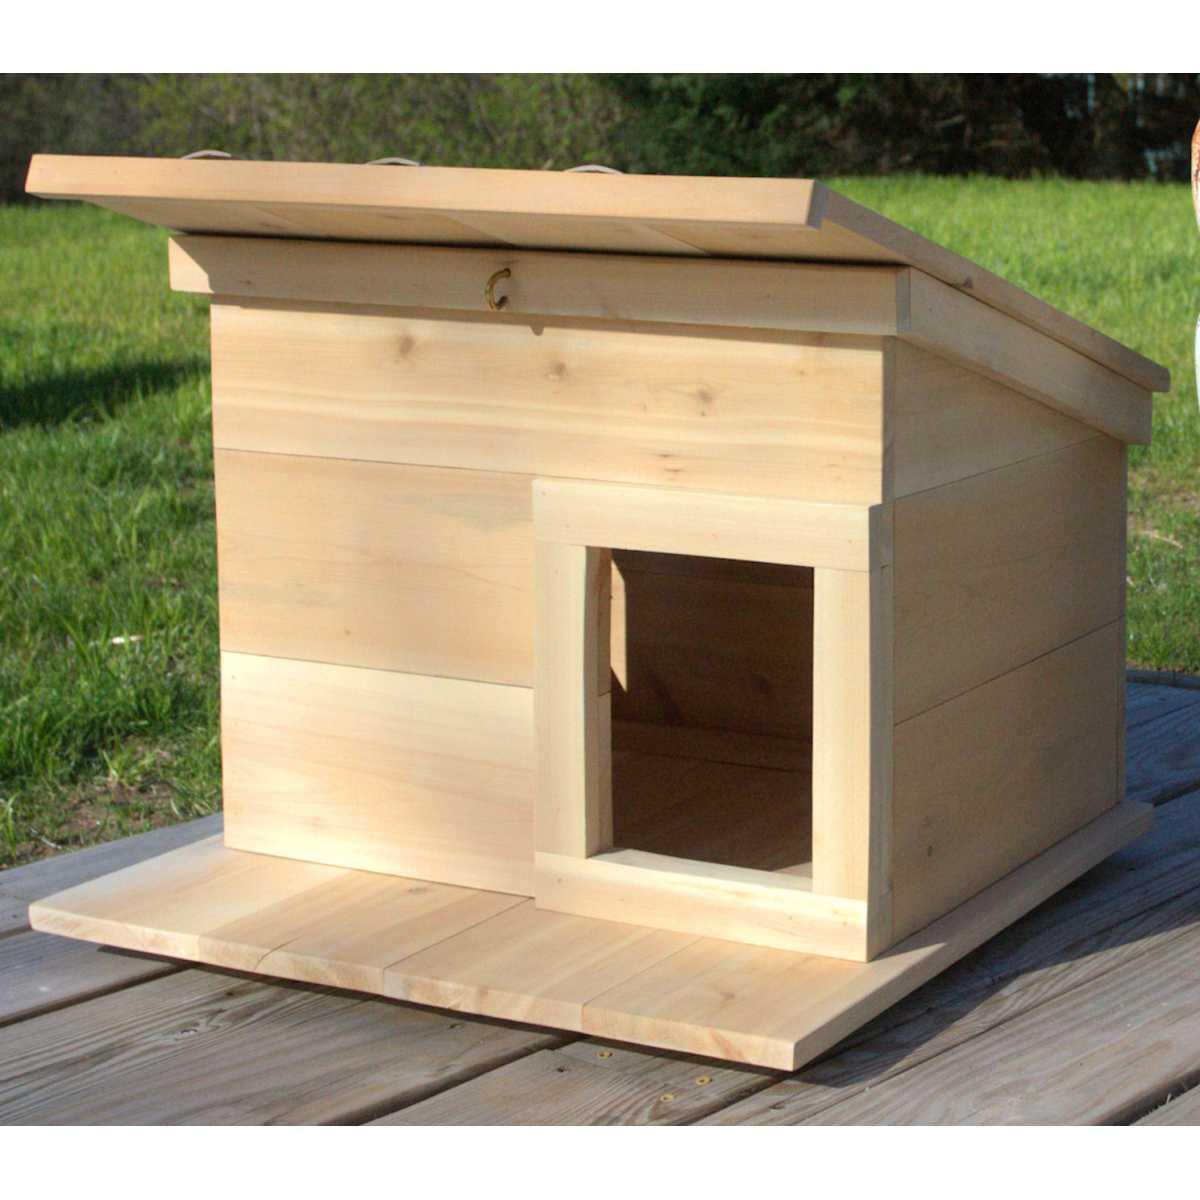 Outdoor Cedar Wood Cat House Shelter Catsplay Superstore